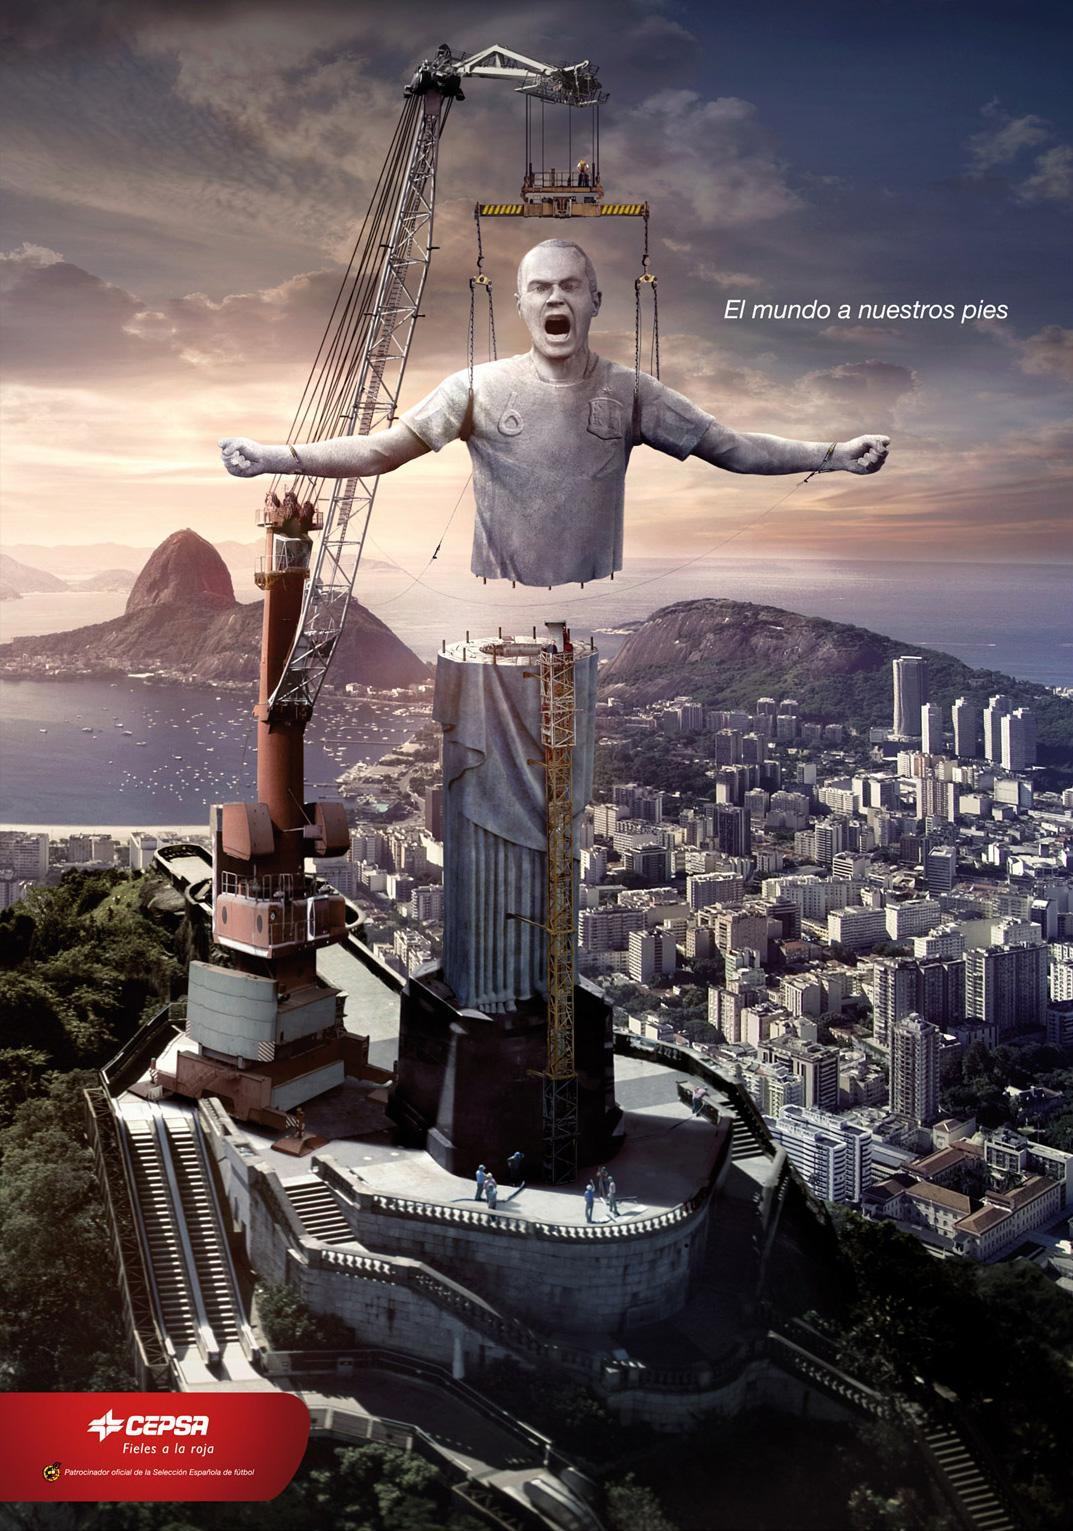 Cepsa Print Ad -  Rio